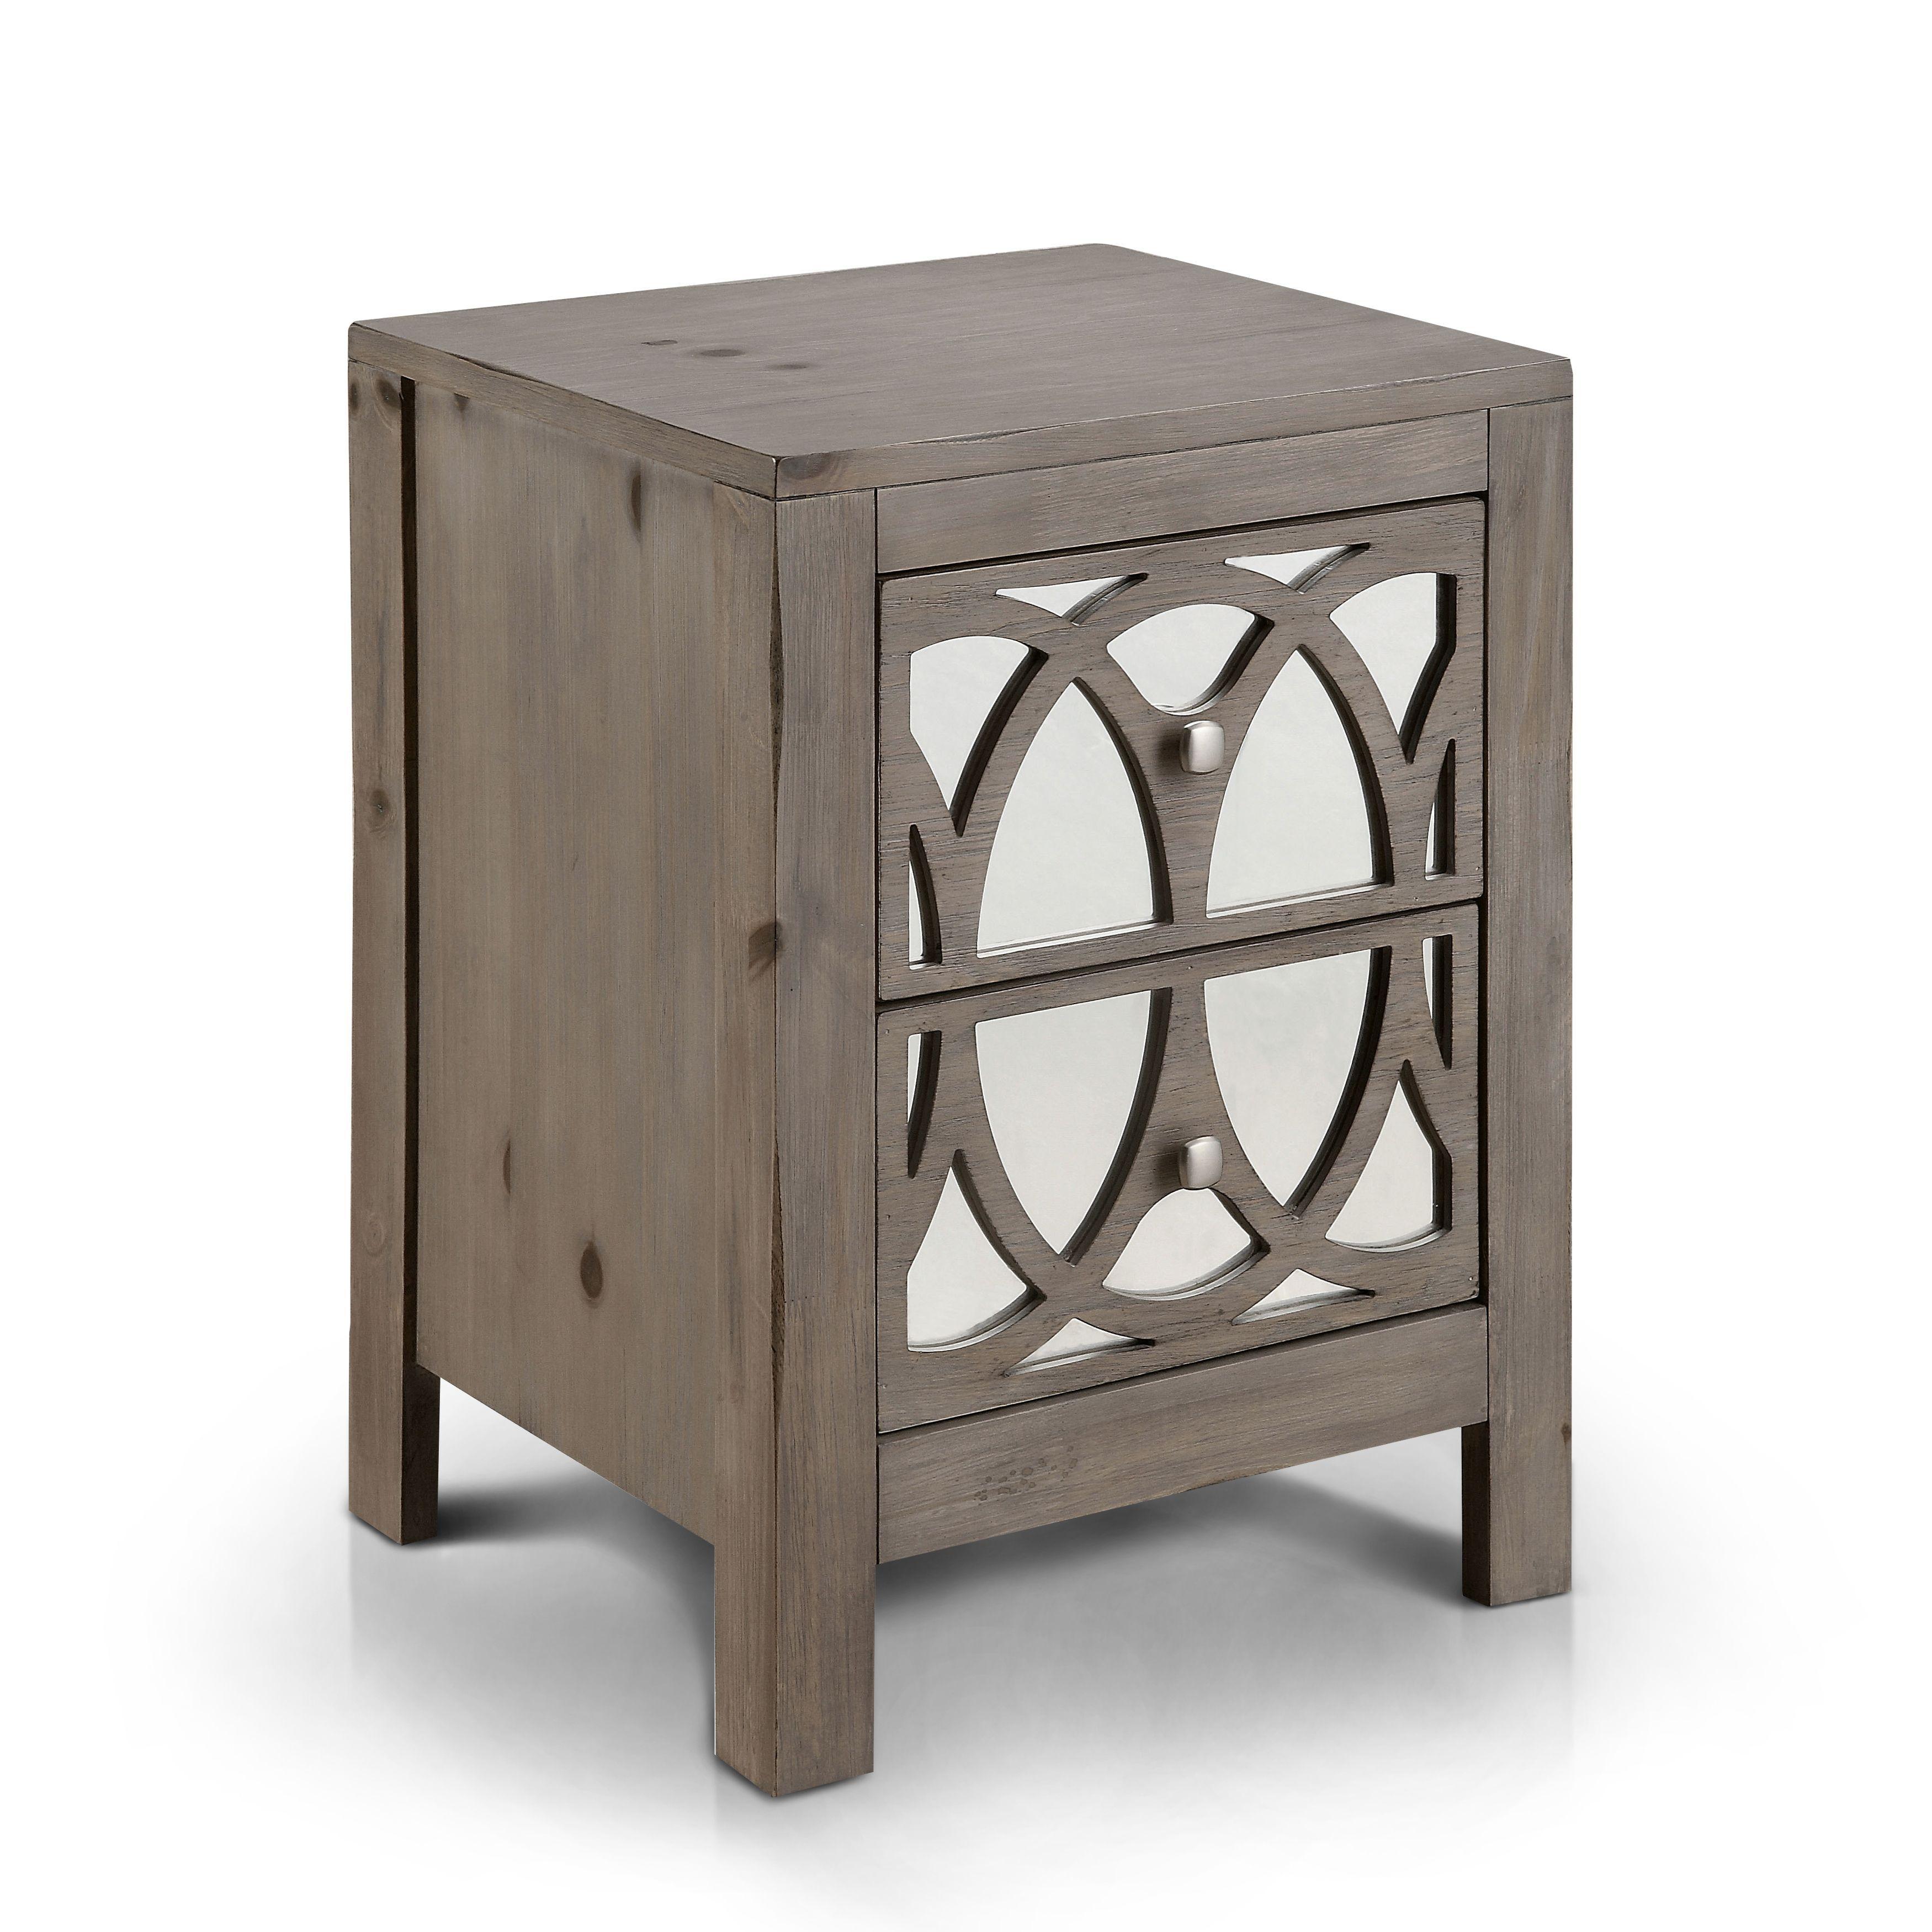 Home Goods Mirrored Furniture: Furniture Of America Alessa Contemporary Mirrored Rustic 2